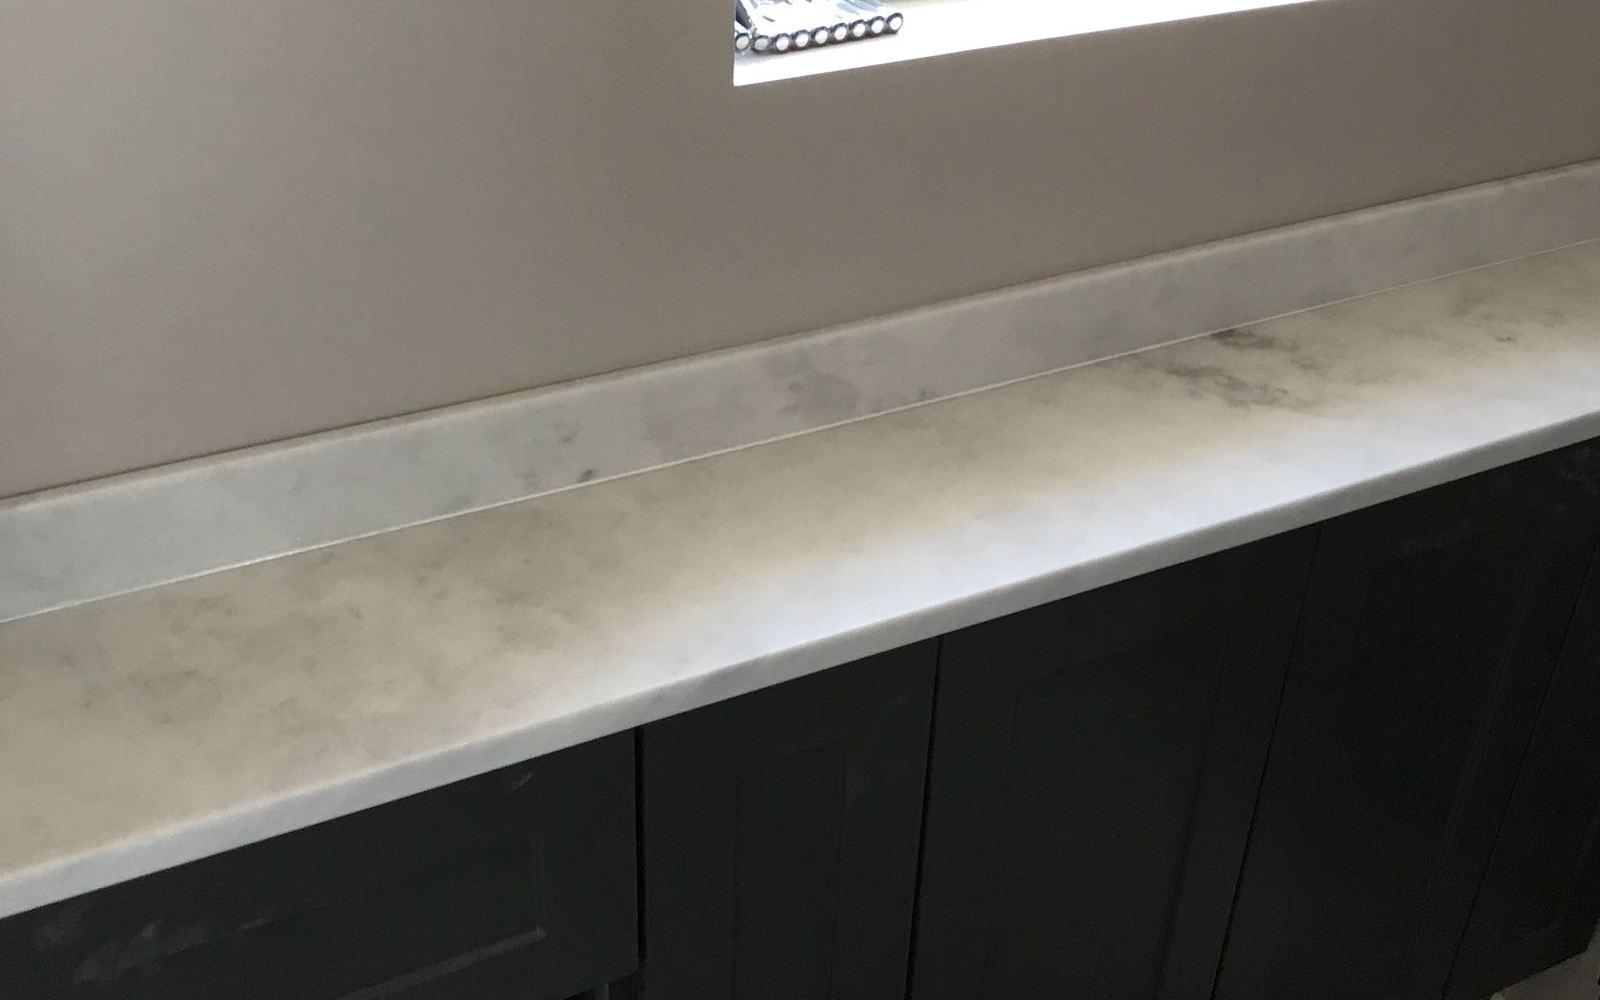 Carrara White, Burnham-on-Crouch, June 2018